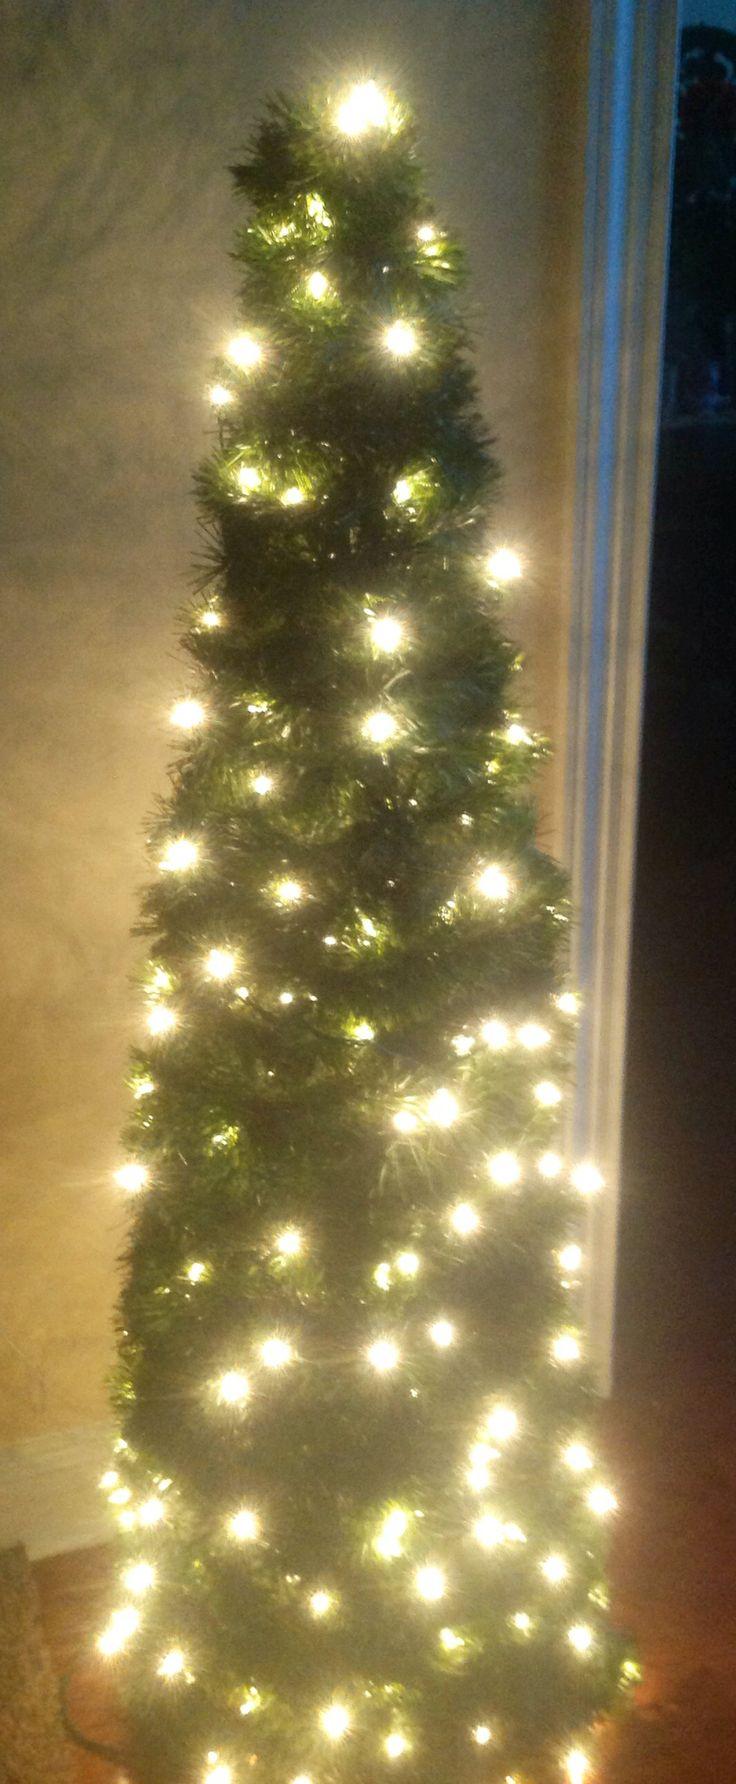 Christmas Tree To Plant